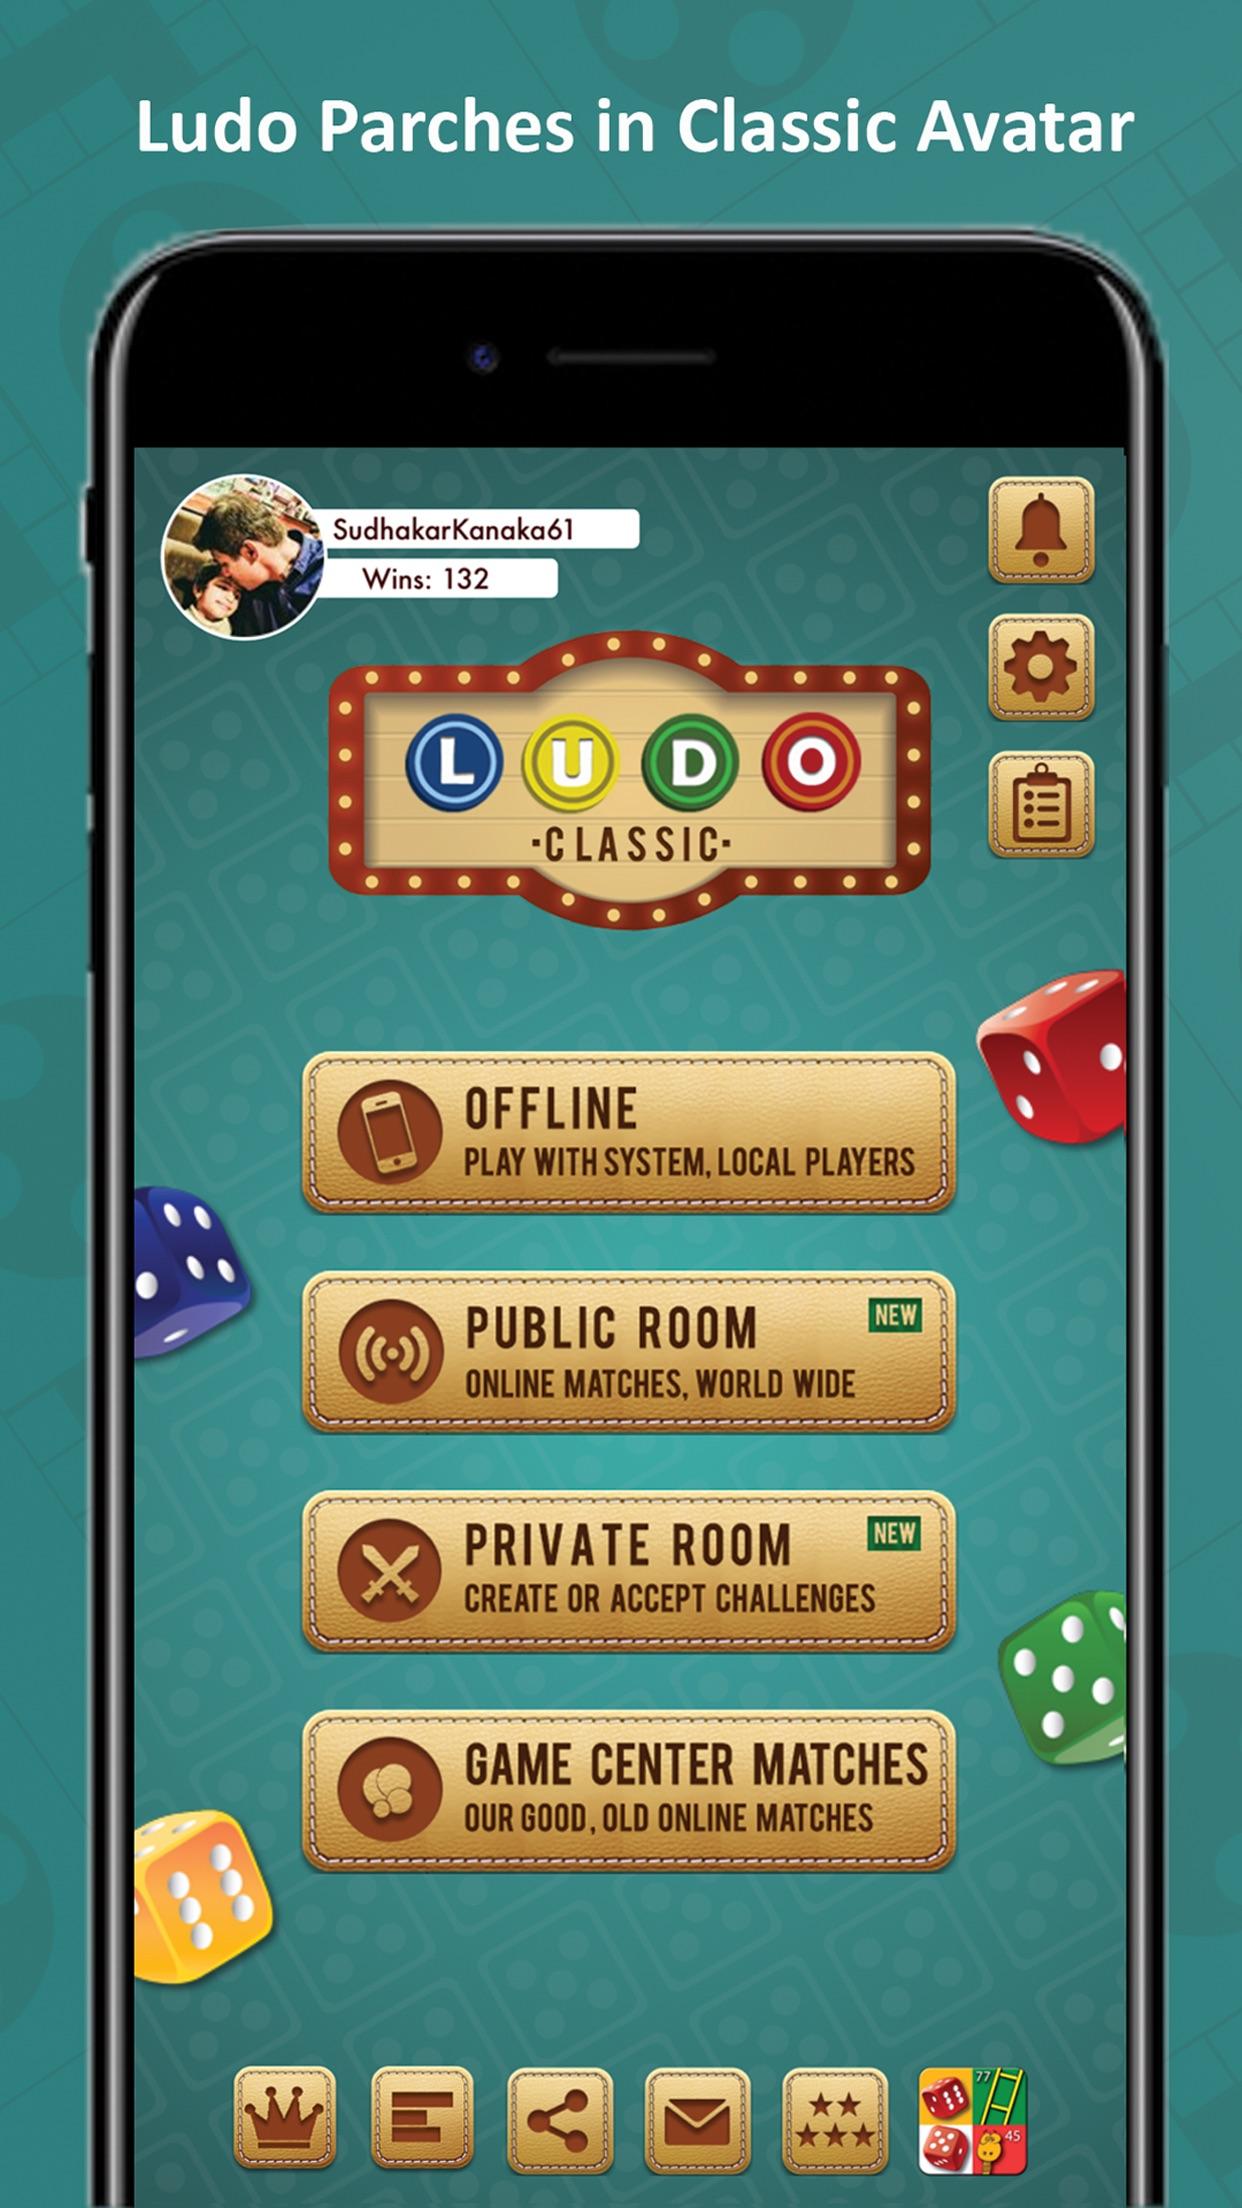 Classic Ludo - Offline & online multiplayer games Screenshot